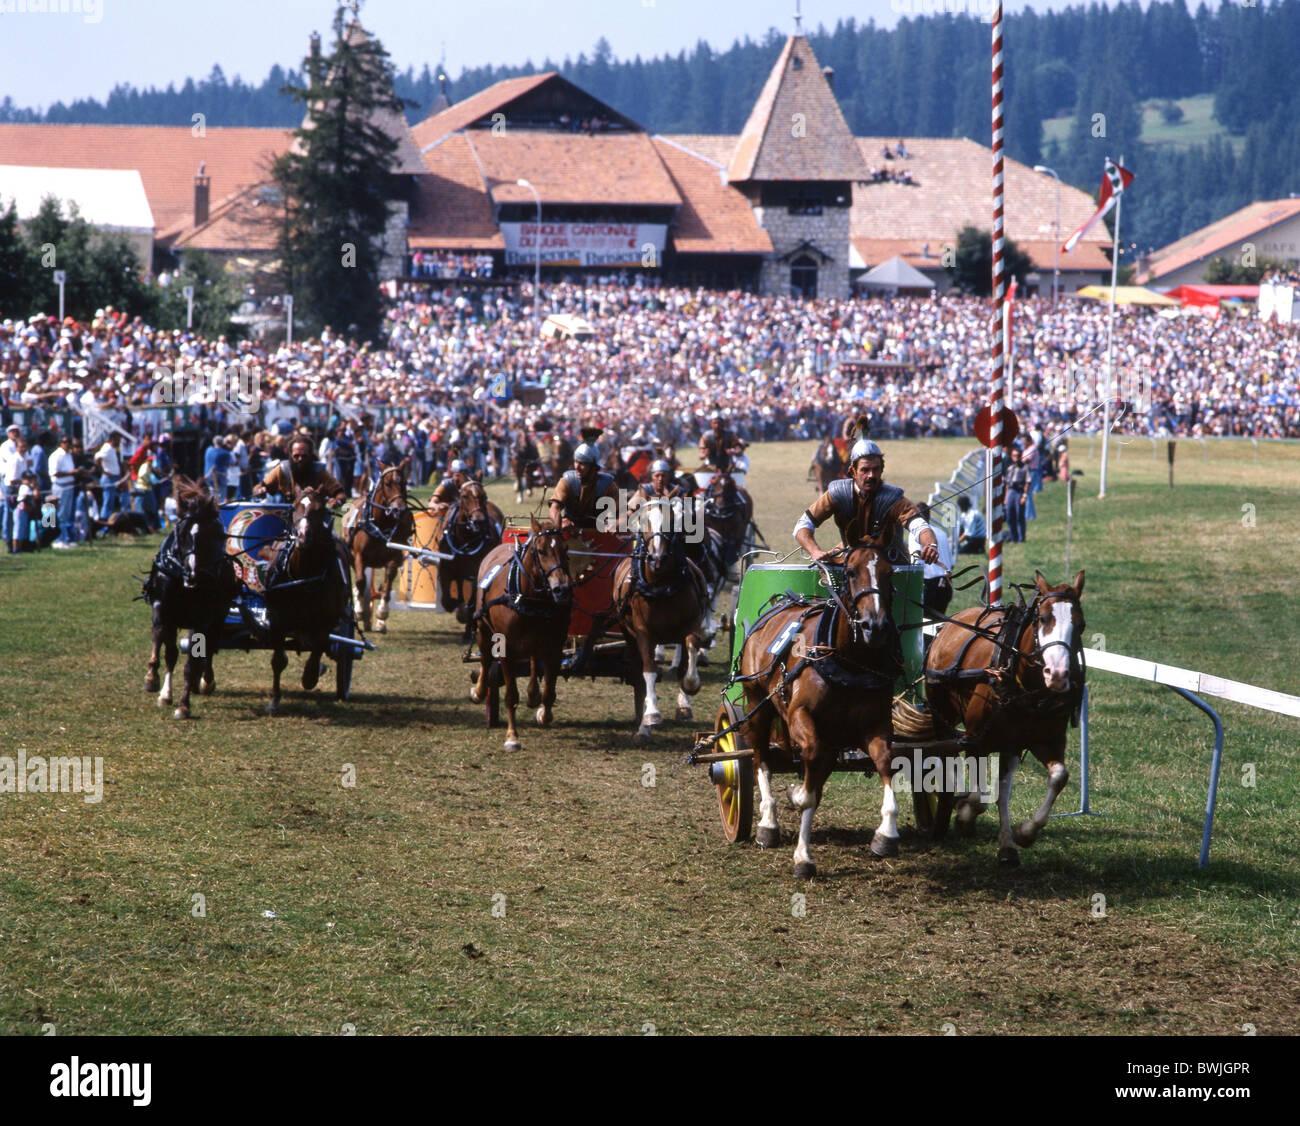 horse-racing Marché-Concours national des chevaux car runnings spectators competition Roman show party fête - Stock Image